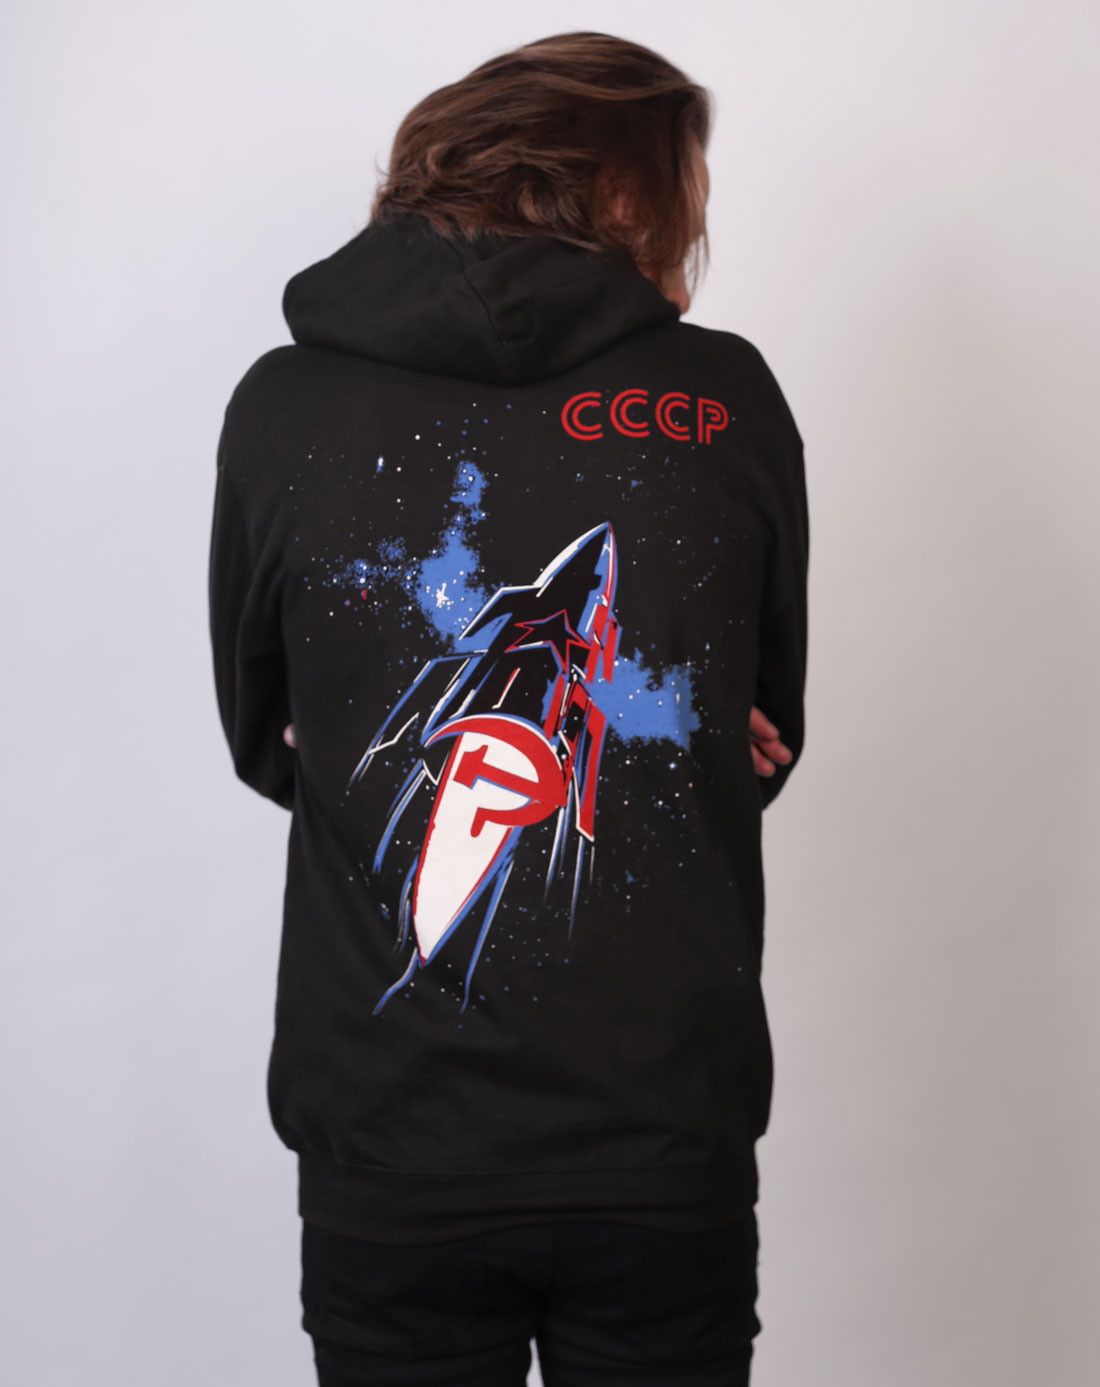 Soviet hoodie